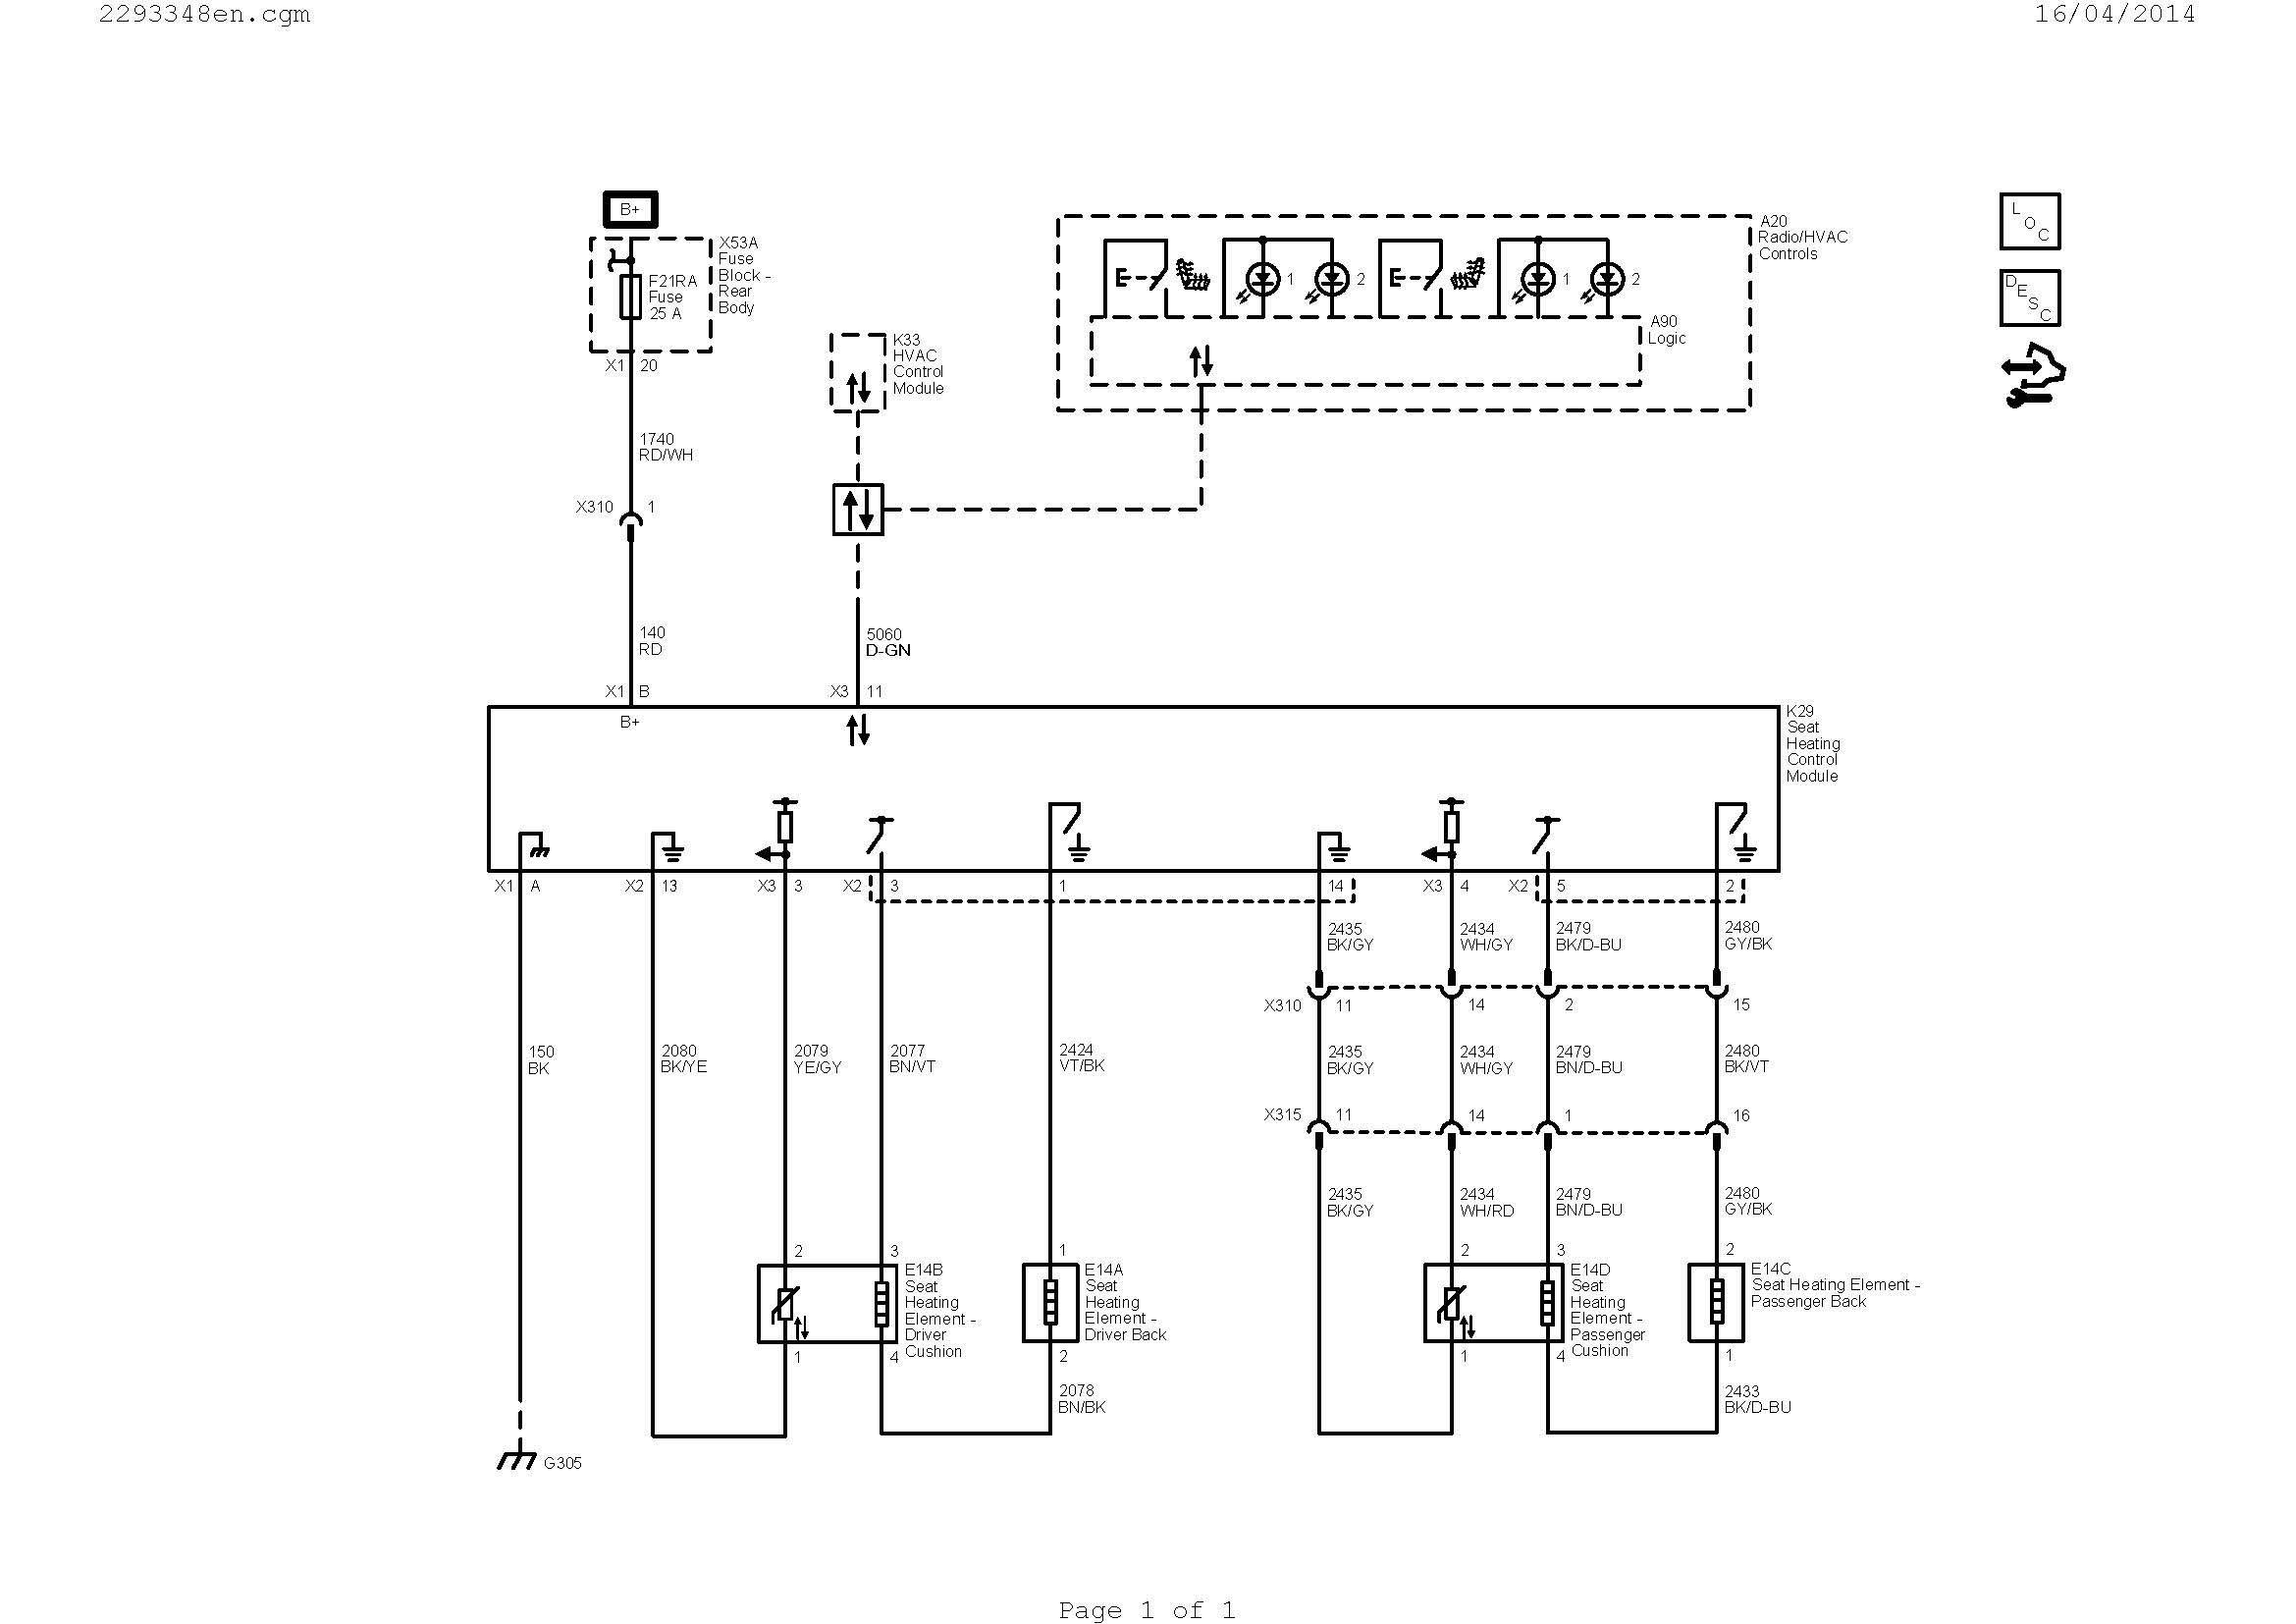 Free Car Wiring Diagrams Rc Wiring Diagrams 3 Cha Wiring Diagram General Of Free Car Wiring Diagrams